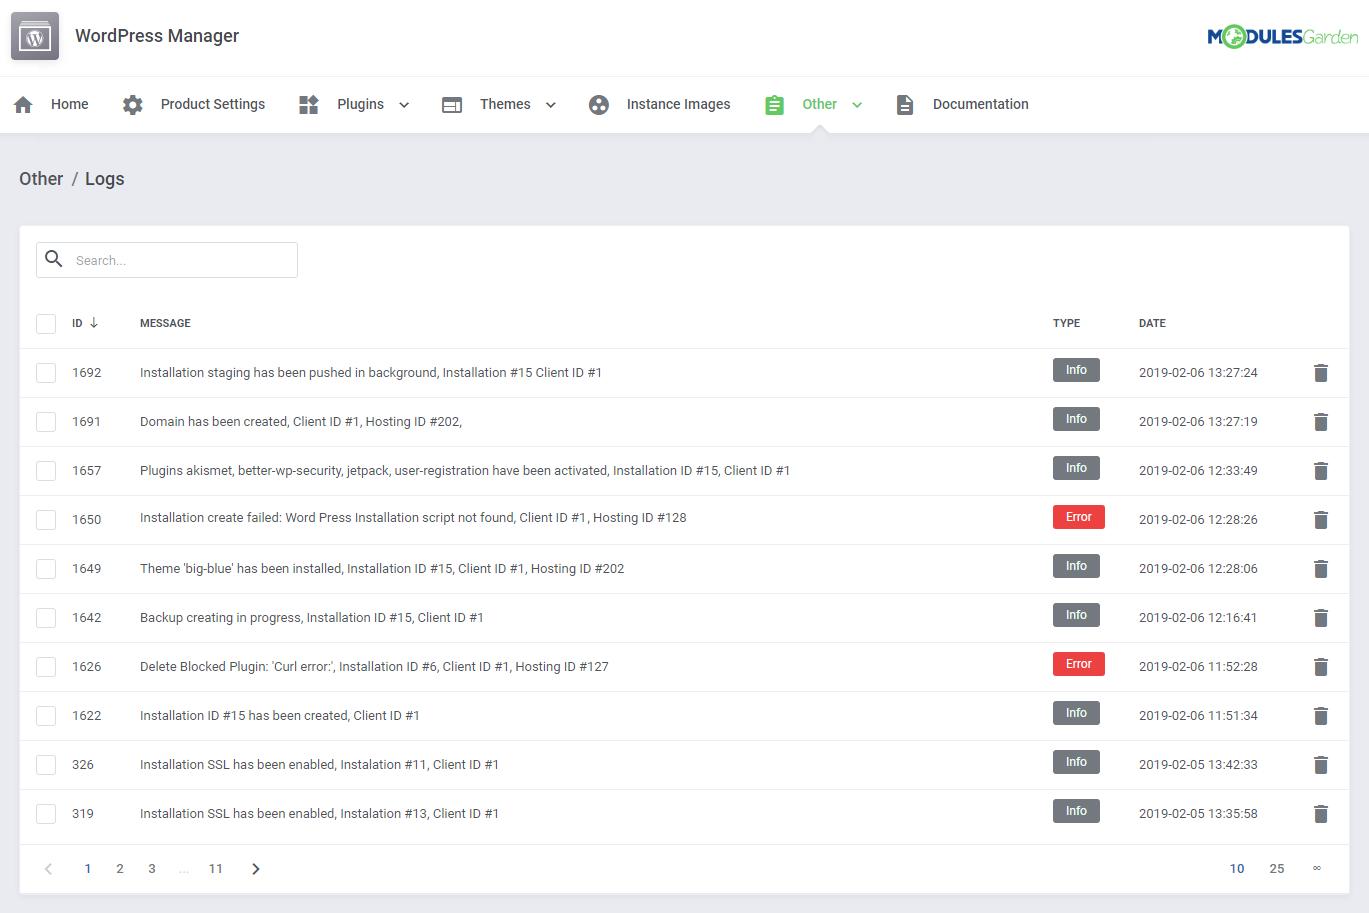 WordPress Manager For WHMCS: Module Screenshot 40